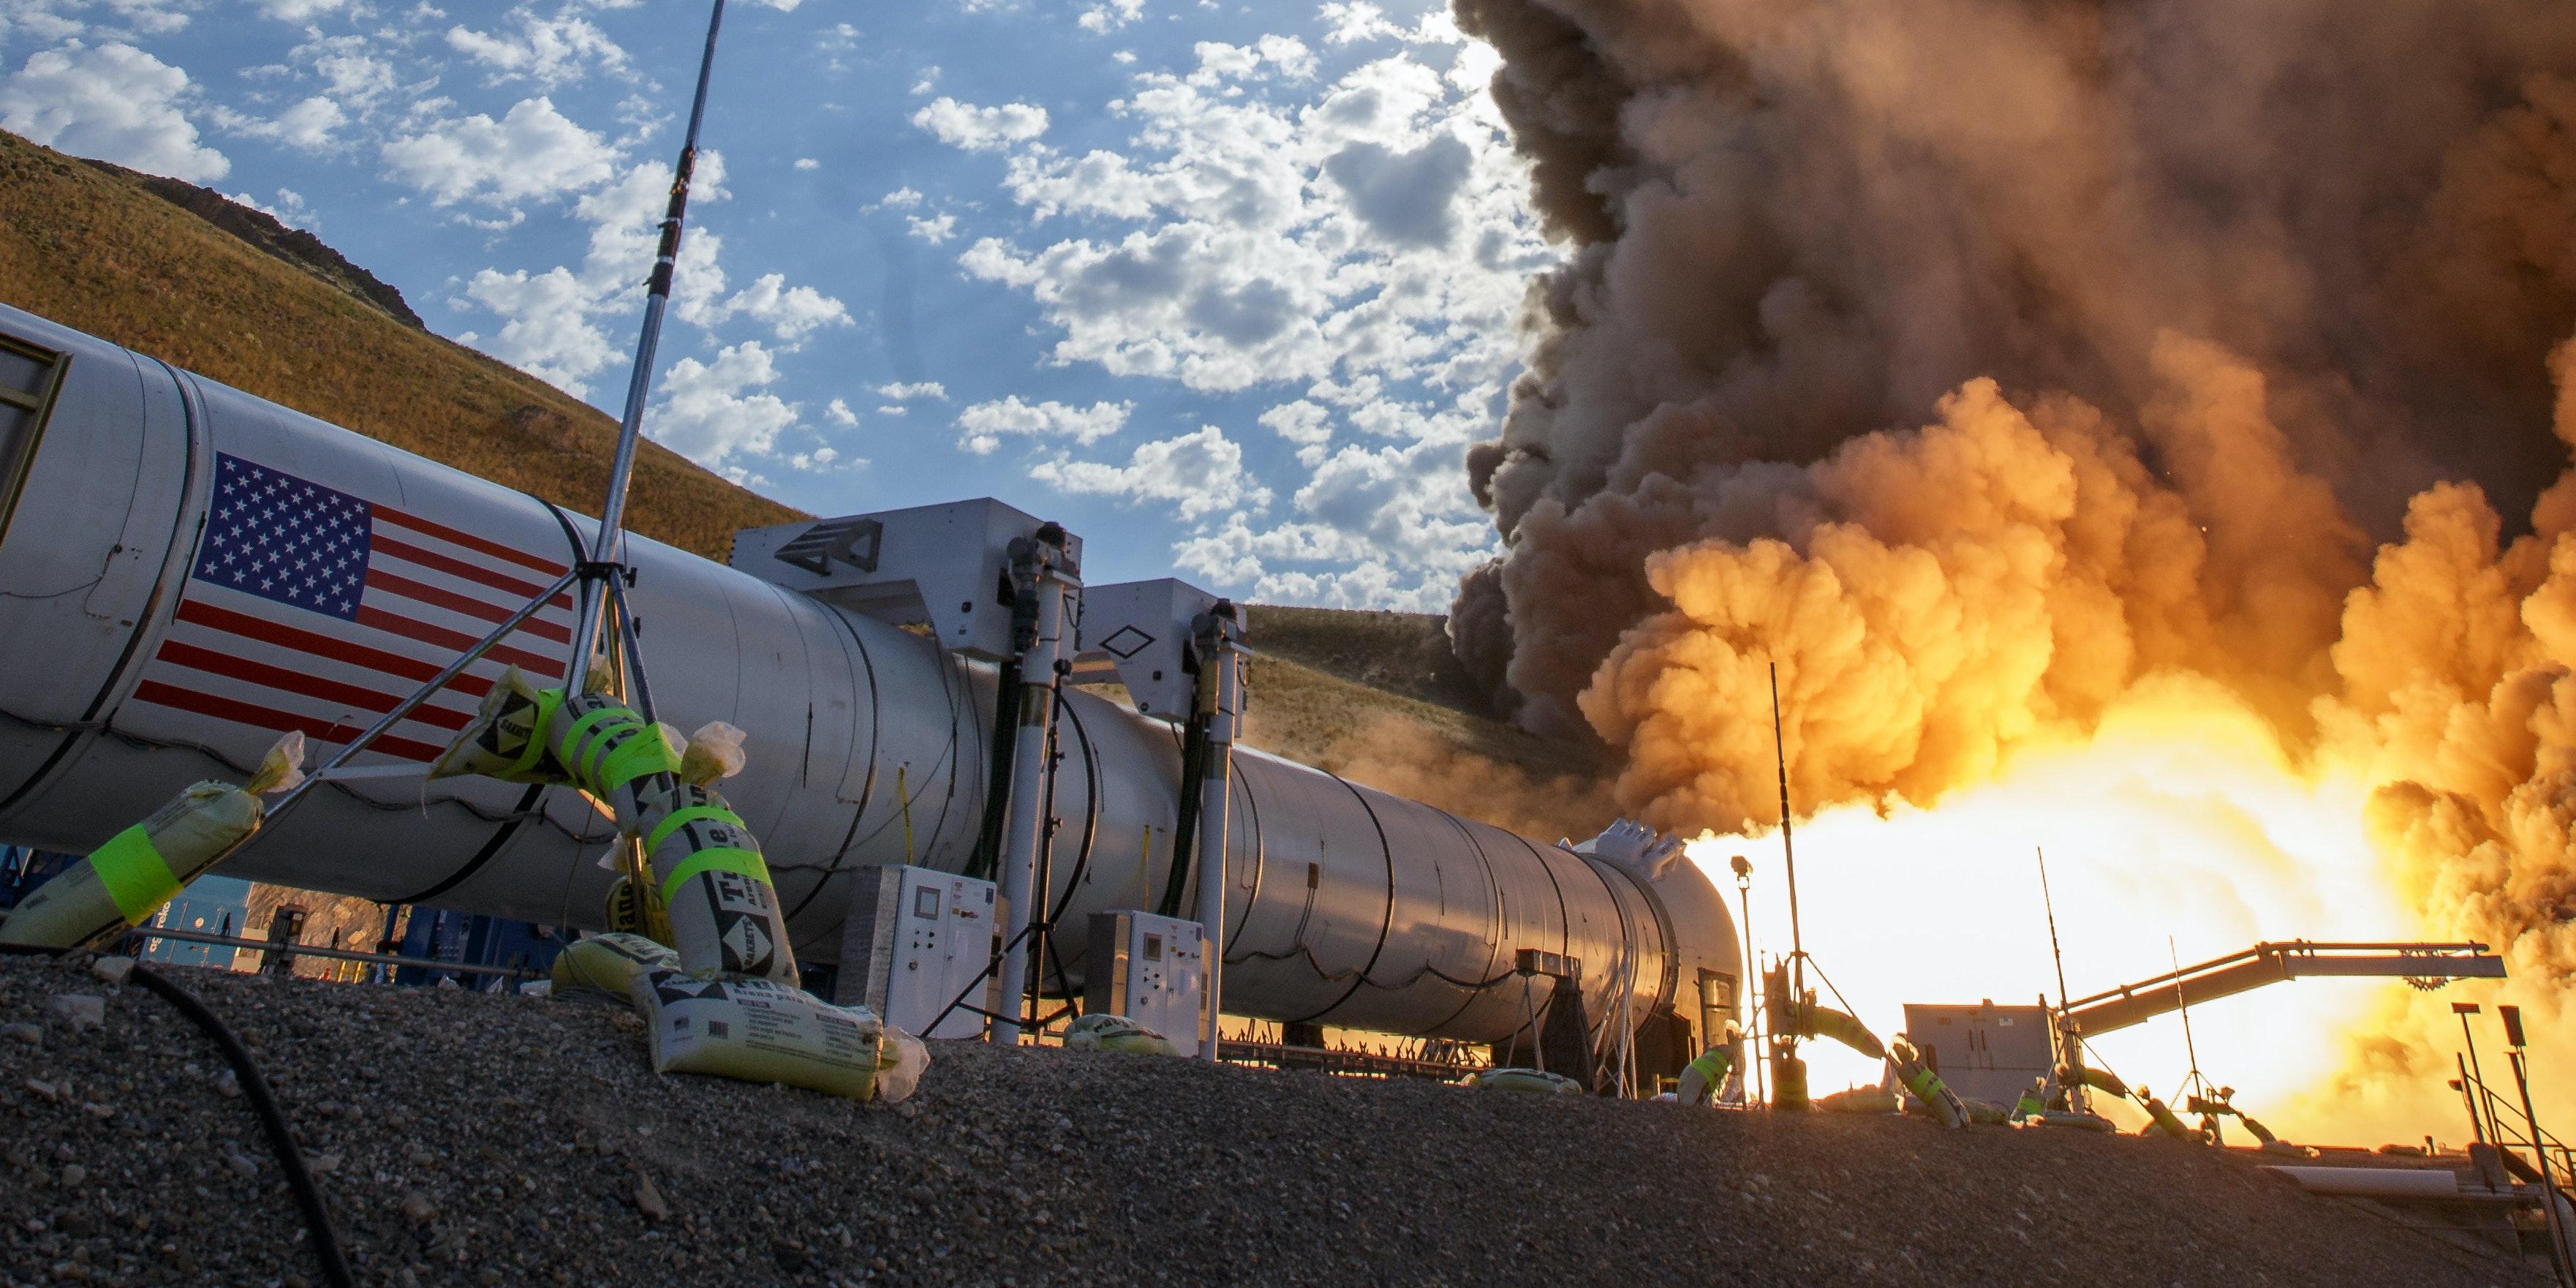 NASA Shares Cool Pics of Massive Rocket That'll Take Us to Mars